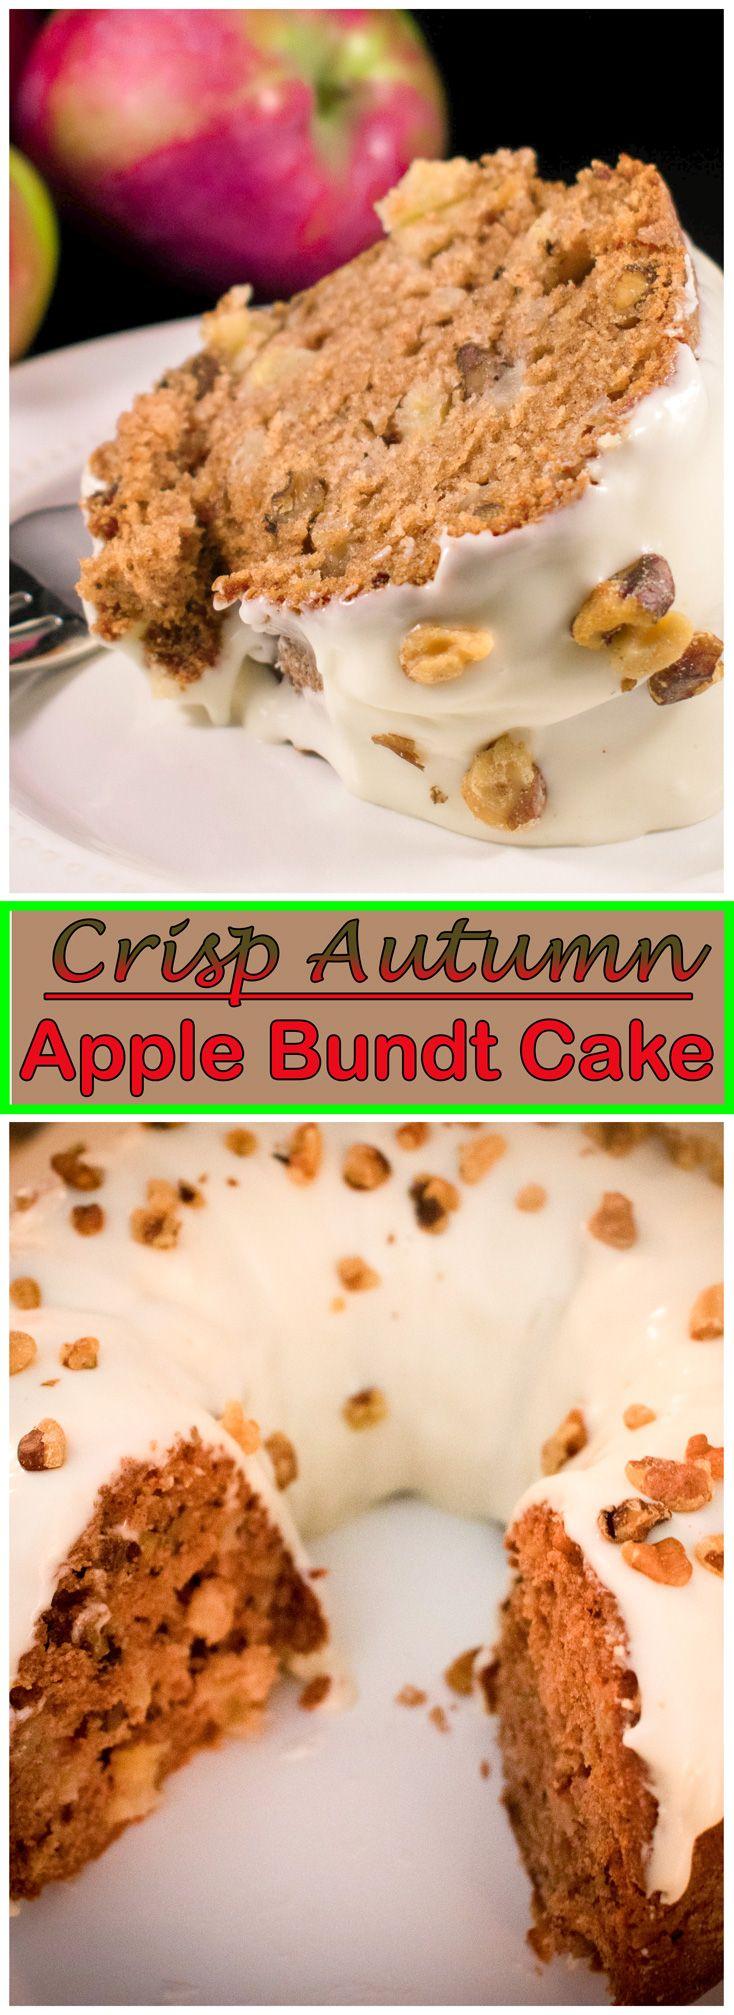 Apple walnut bundt cake with cream cheese frosting